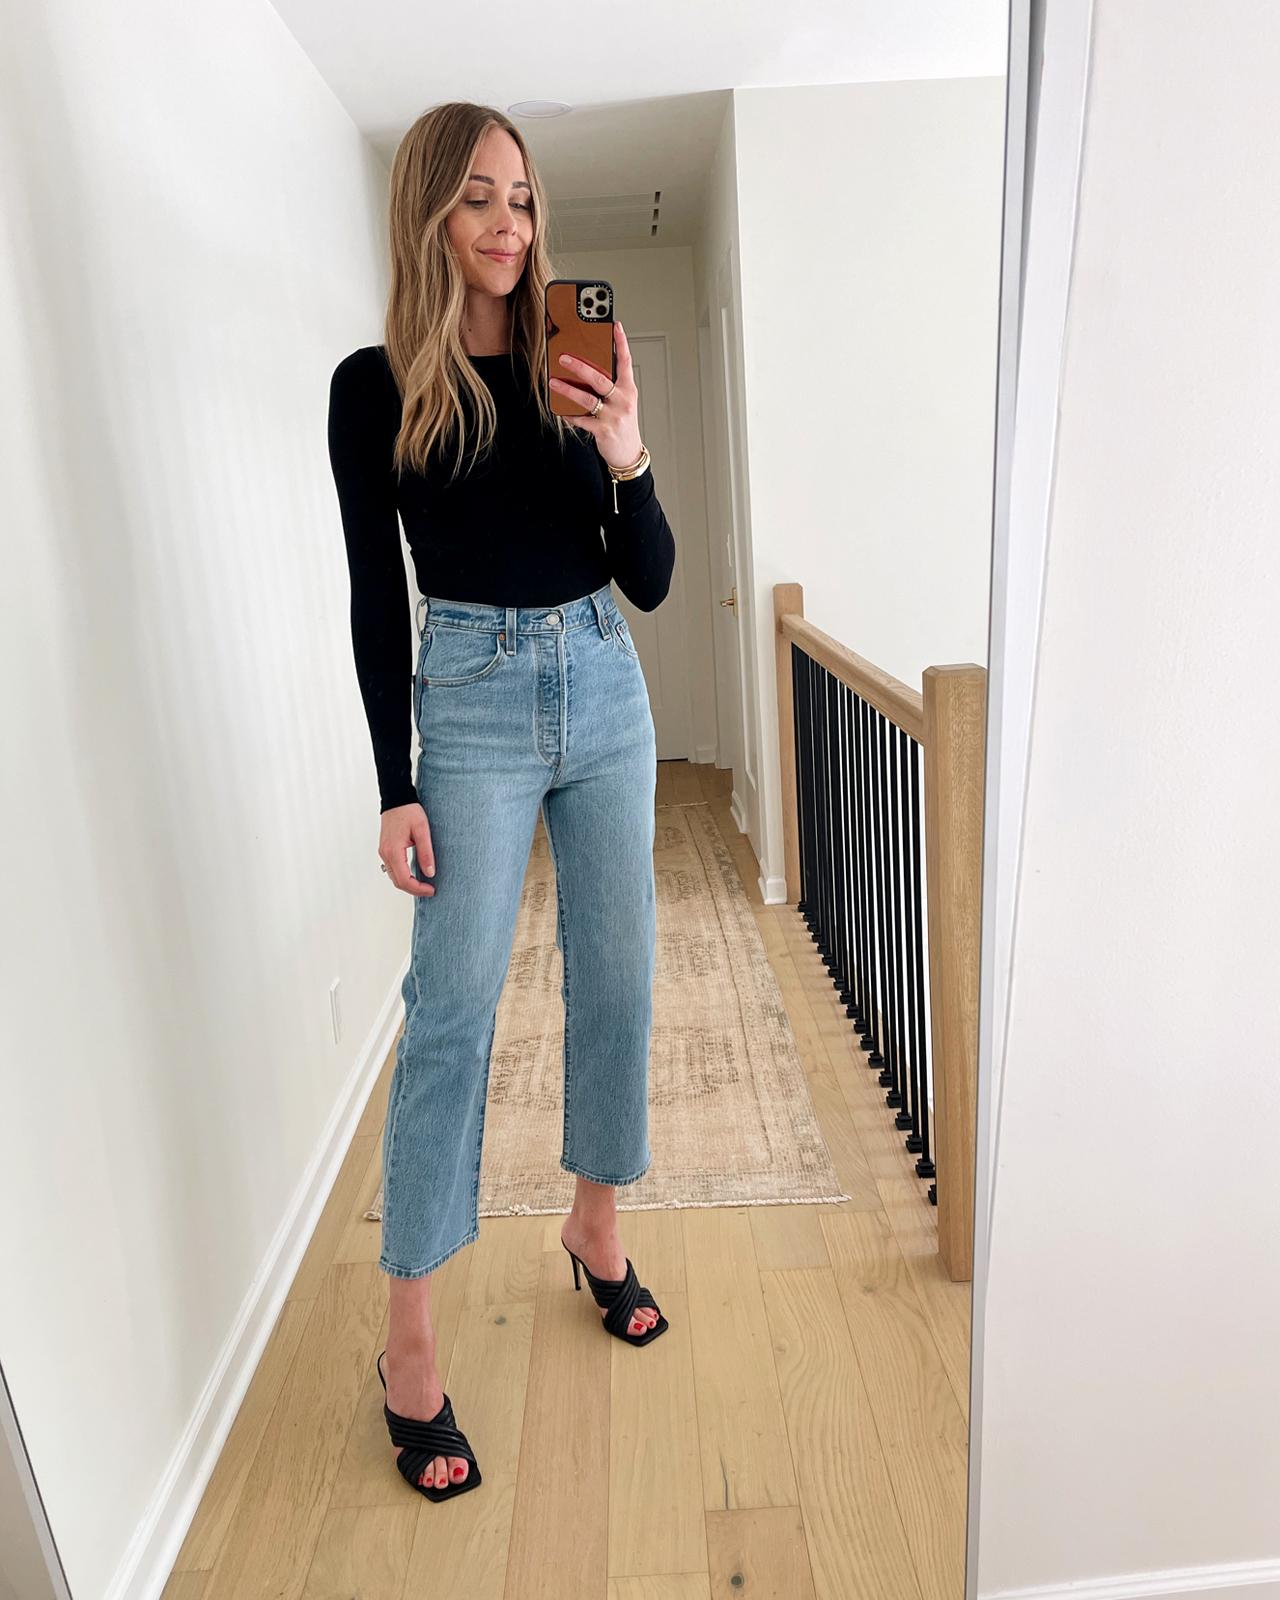 Fashion Jackson Wearing Levis Ribcage Straight Ankle Jeans Review Black Bodysuit Black Heeled Sandals